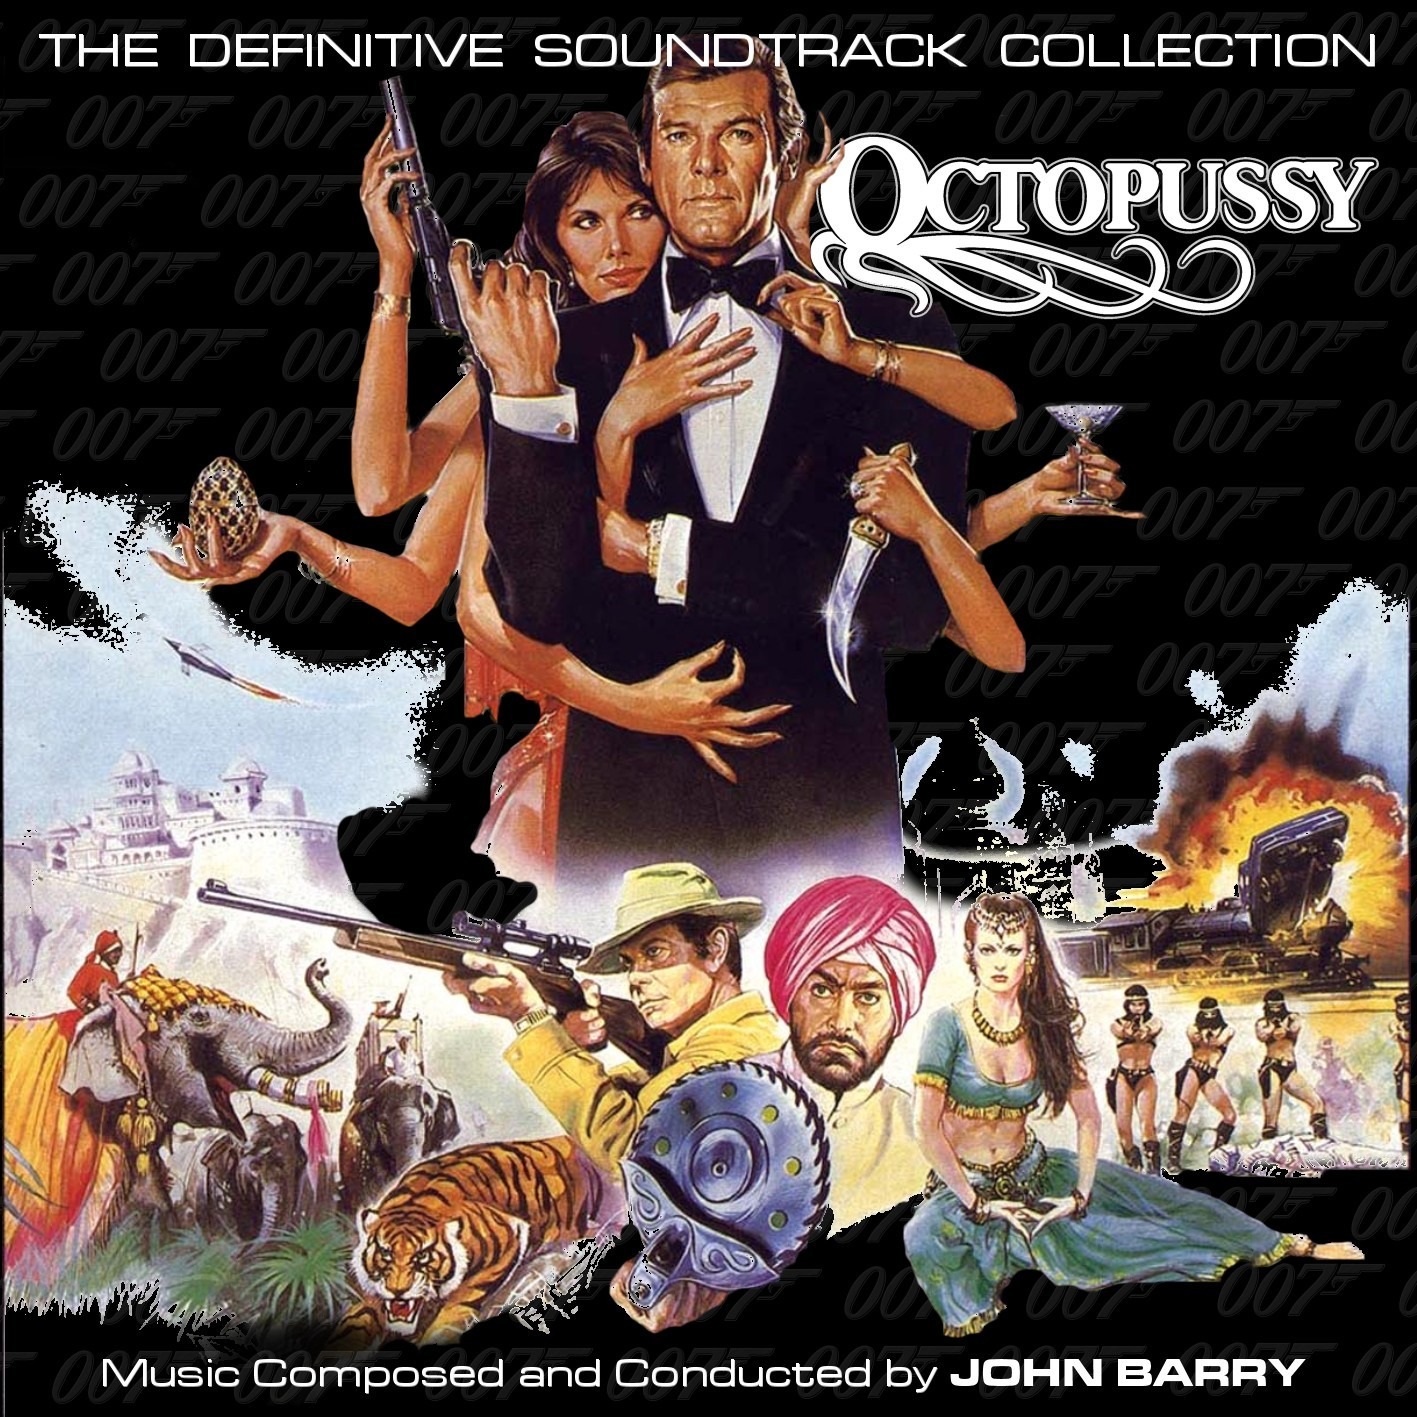 Das nächste Ritual? - Seite 7 %5BAllCDCovers%5D_soundtrack_octopussy_2003_custom_cd-front